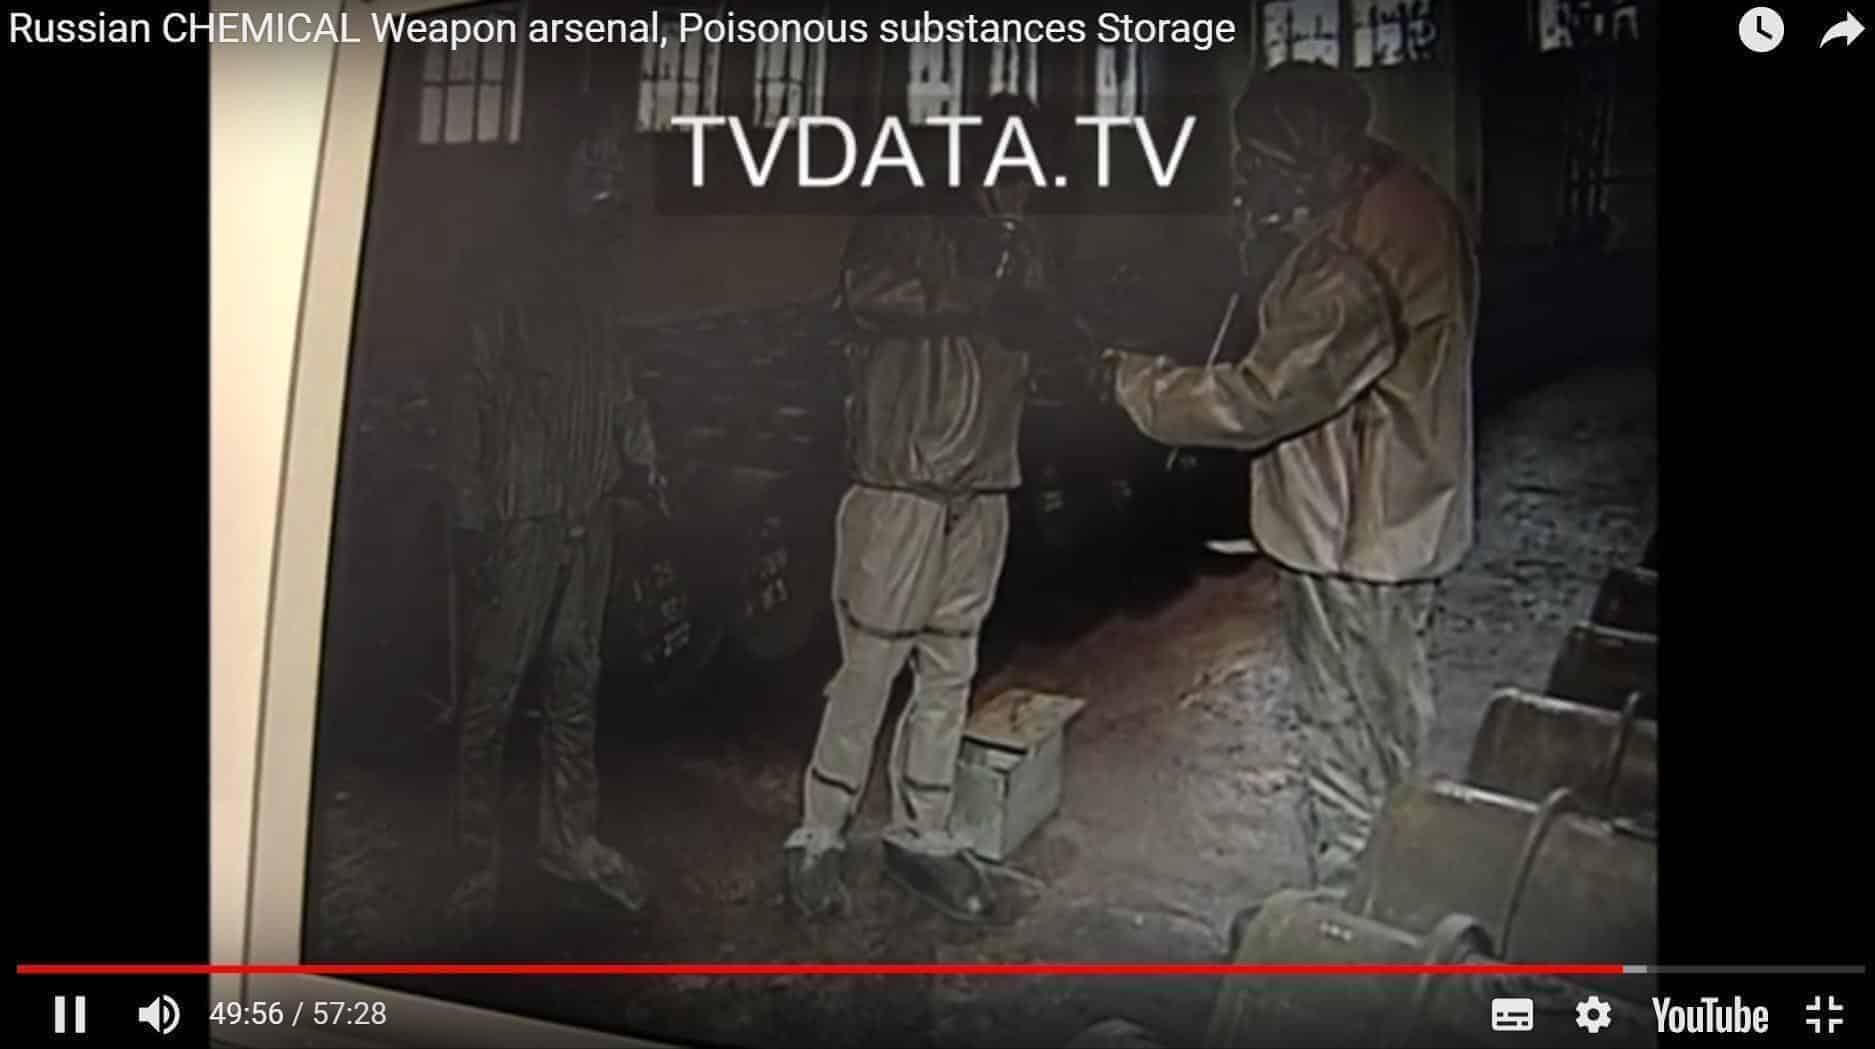 Chemical Arsenal Storage